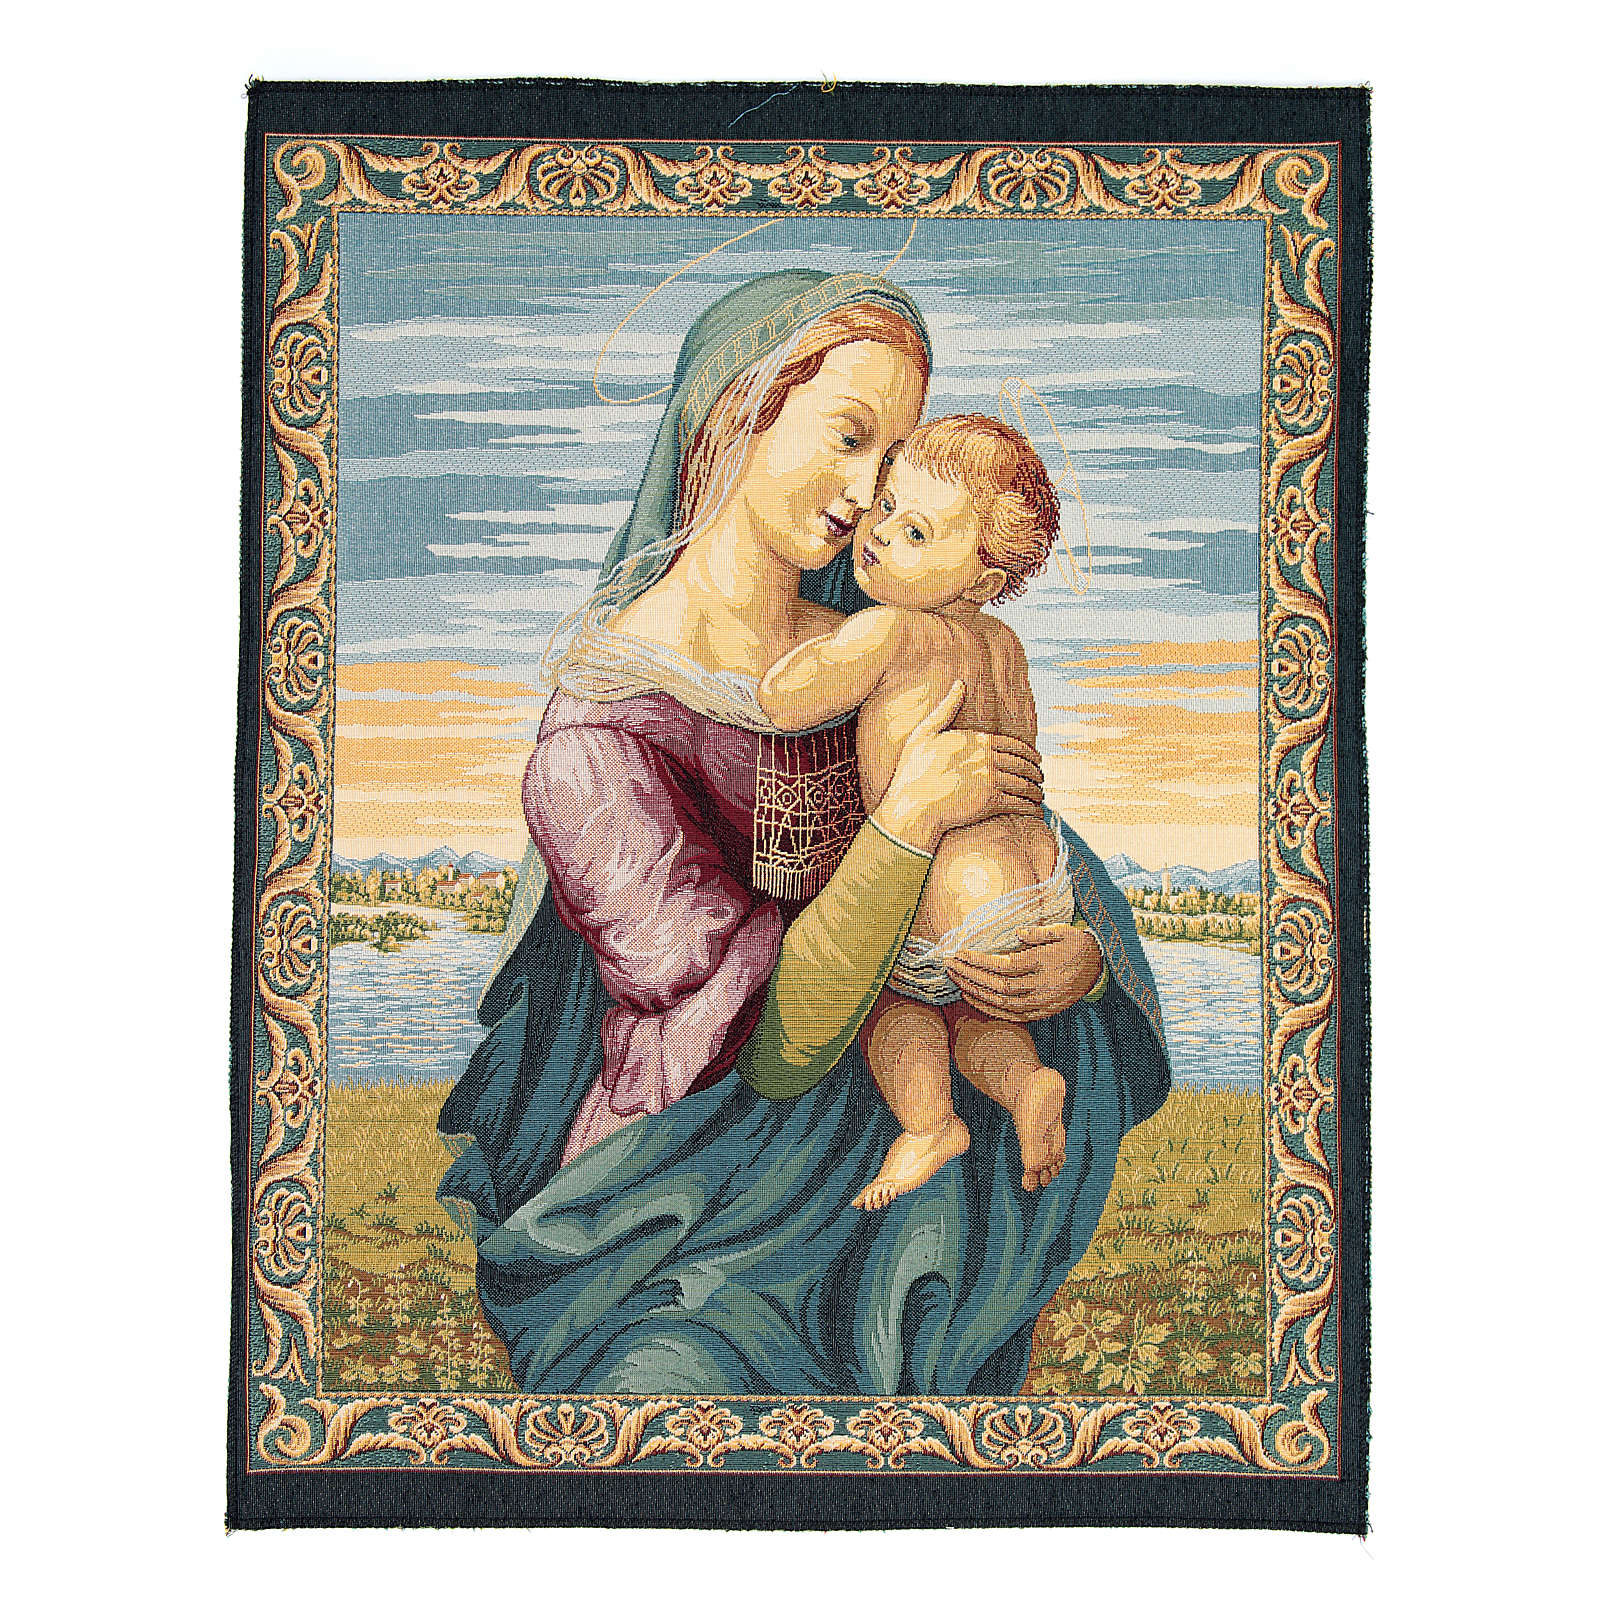 Gobelin Madonna Tempi Raffaella Sanzio 65x50 cm 3